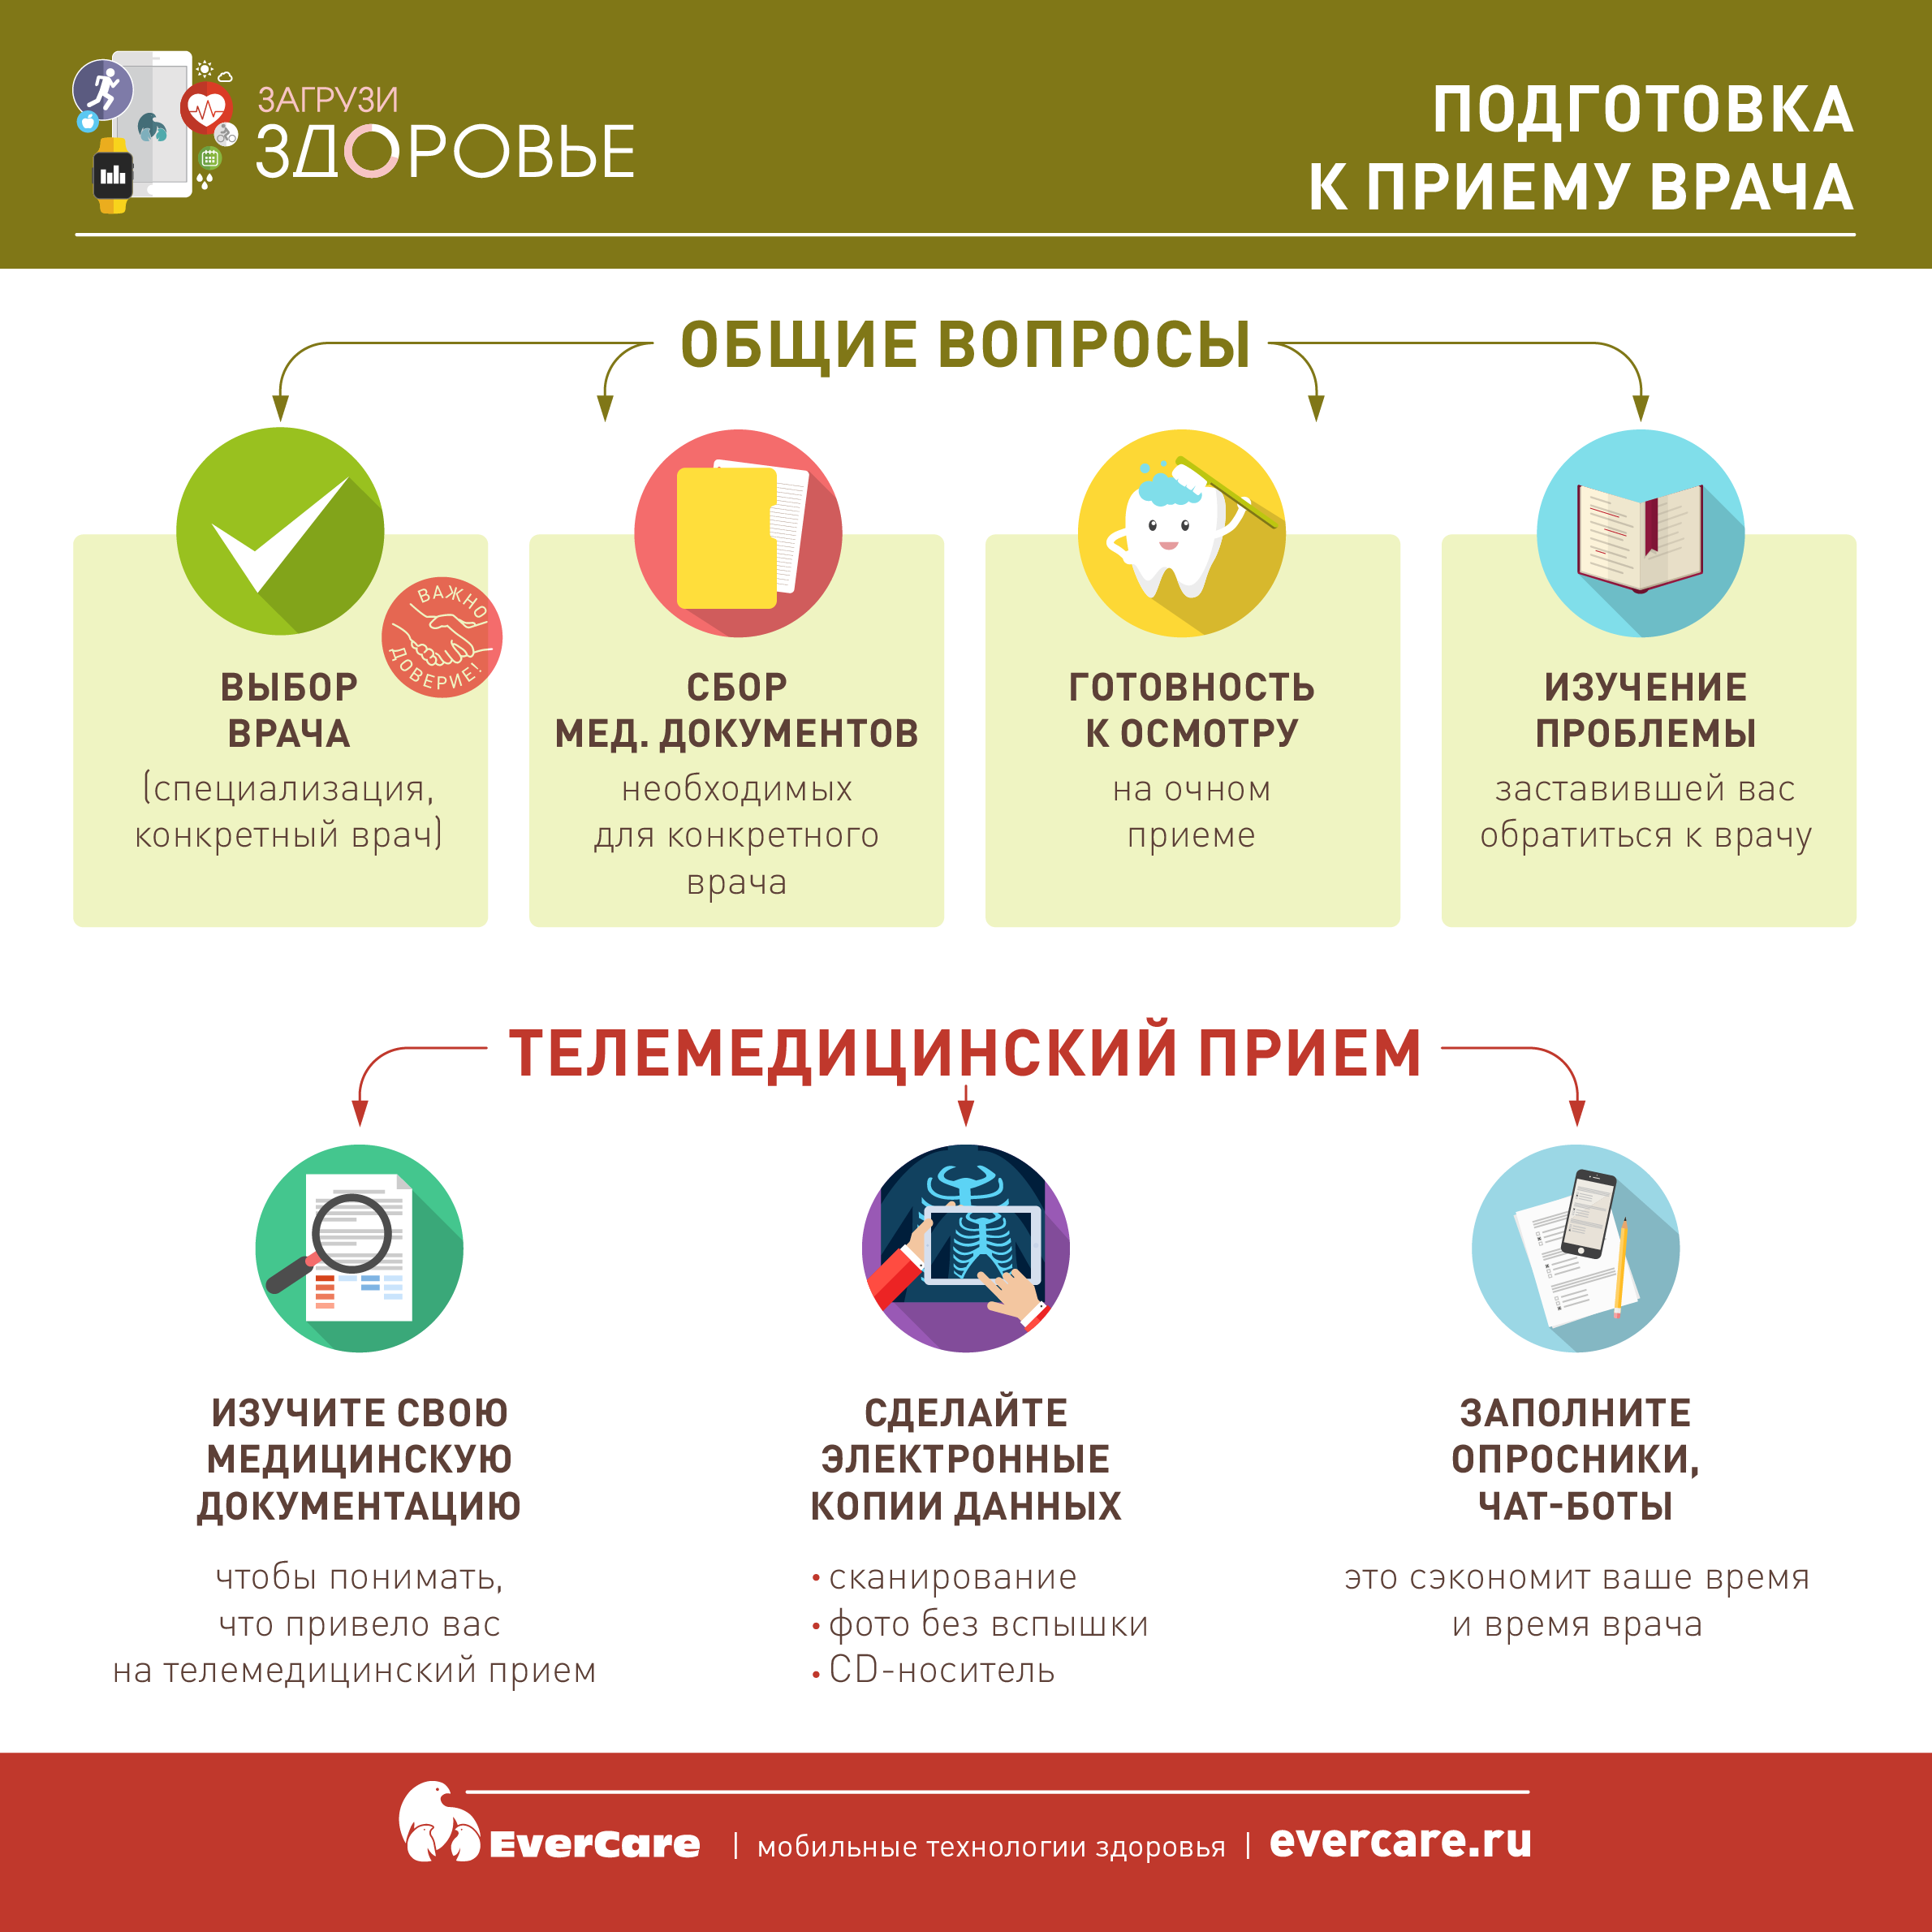 Подготовка к визиту врача, Инфографика